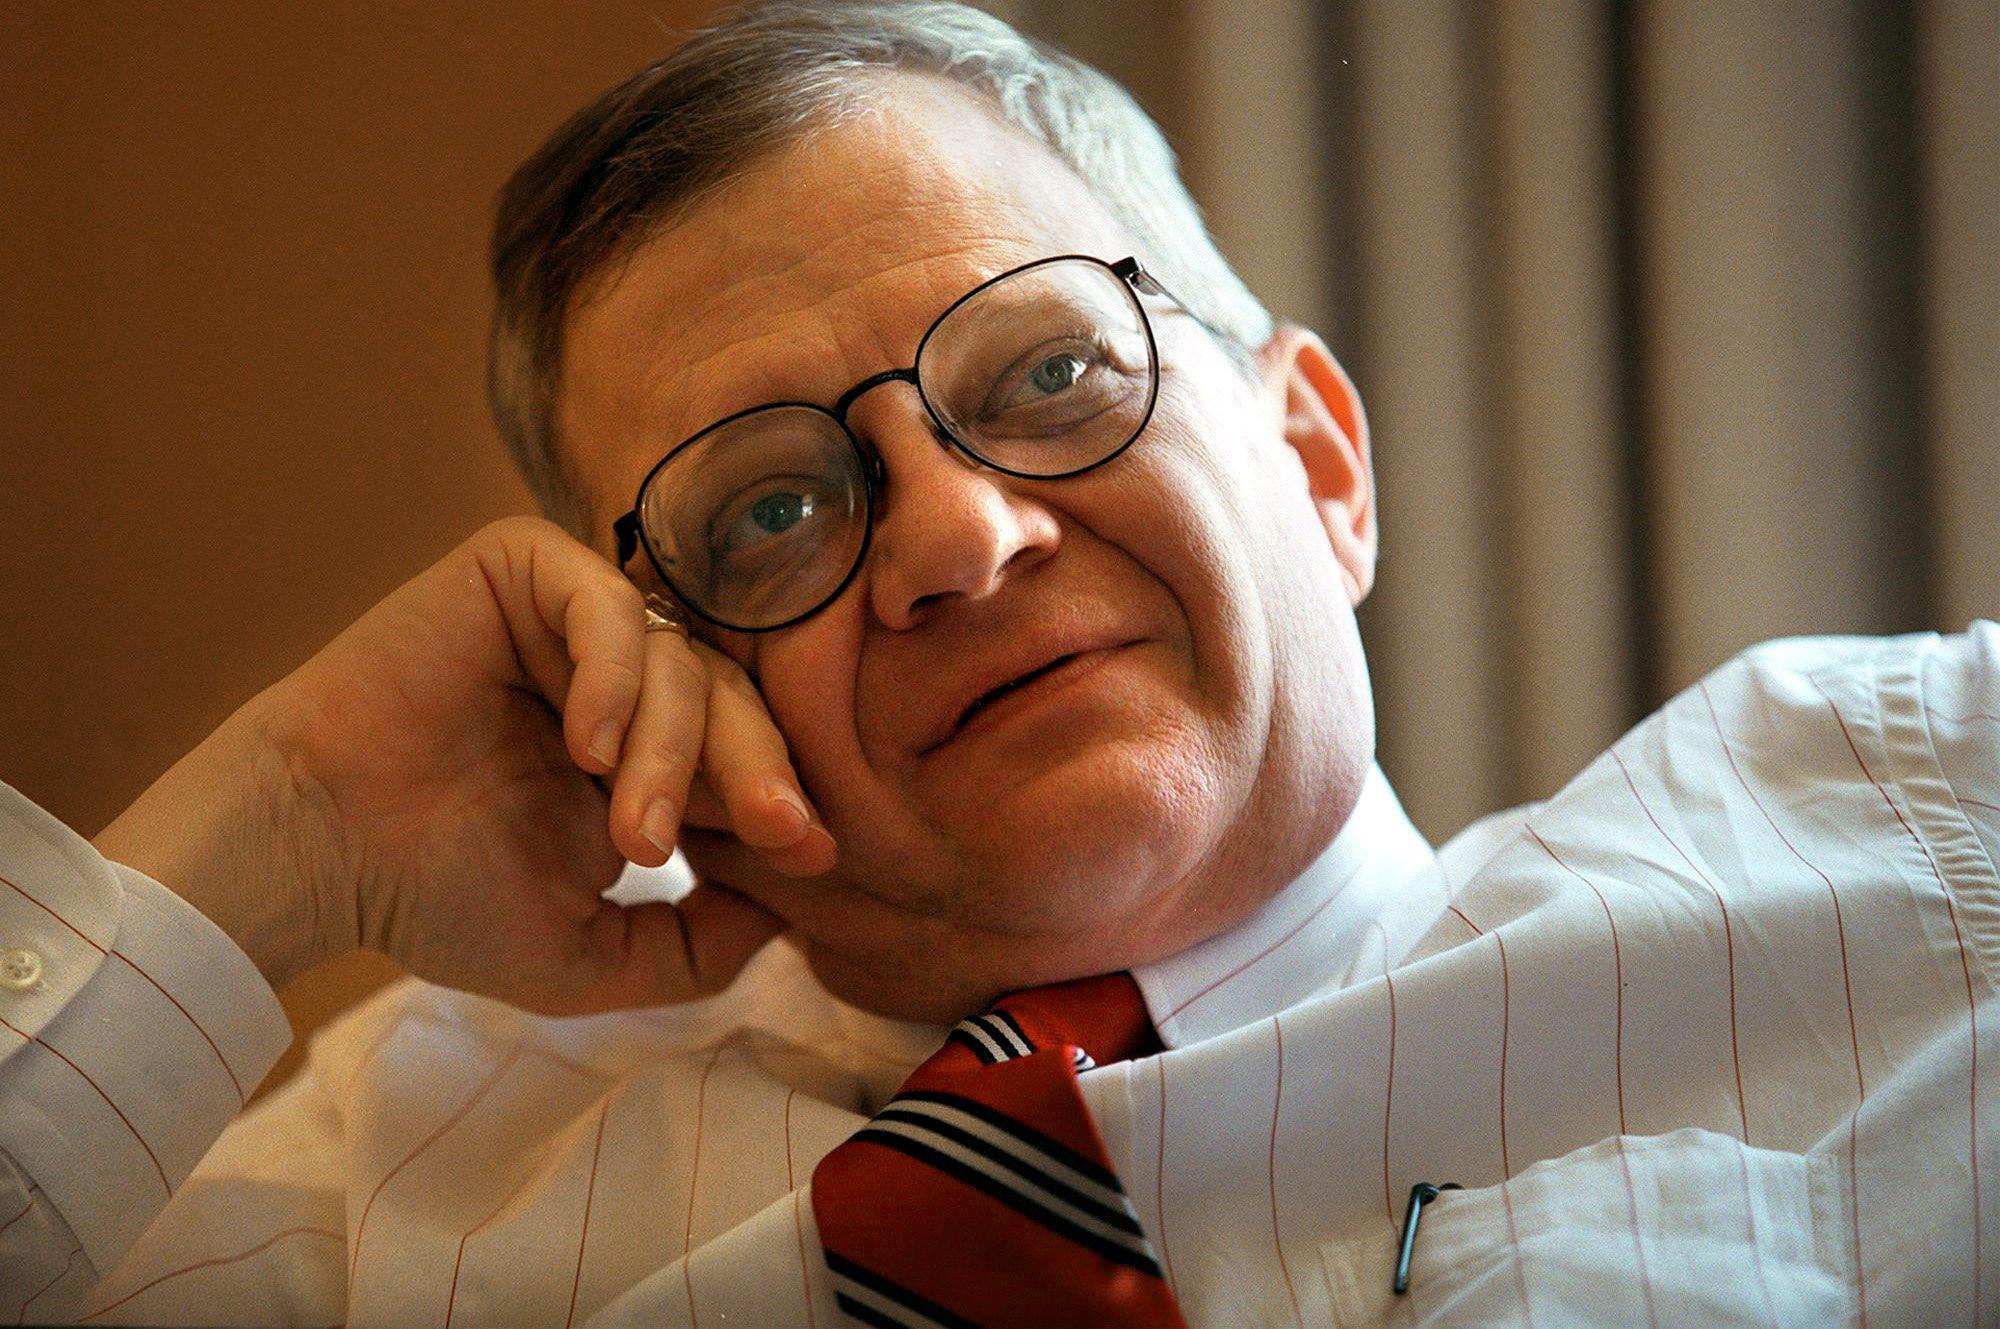 Tom Clancy S 82m Estate Focus Of Legal Tussle Between Widow Lawyer Baltimore Sun